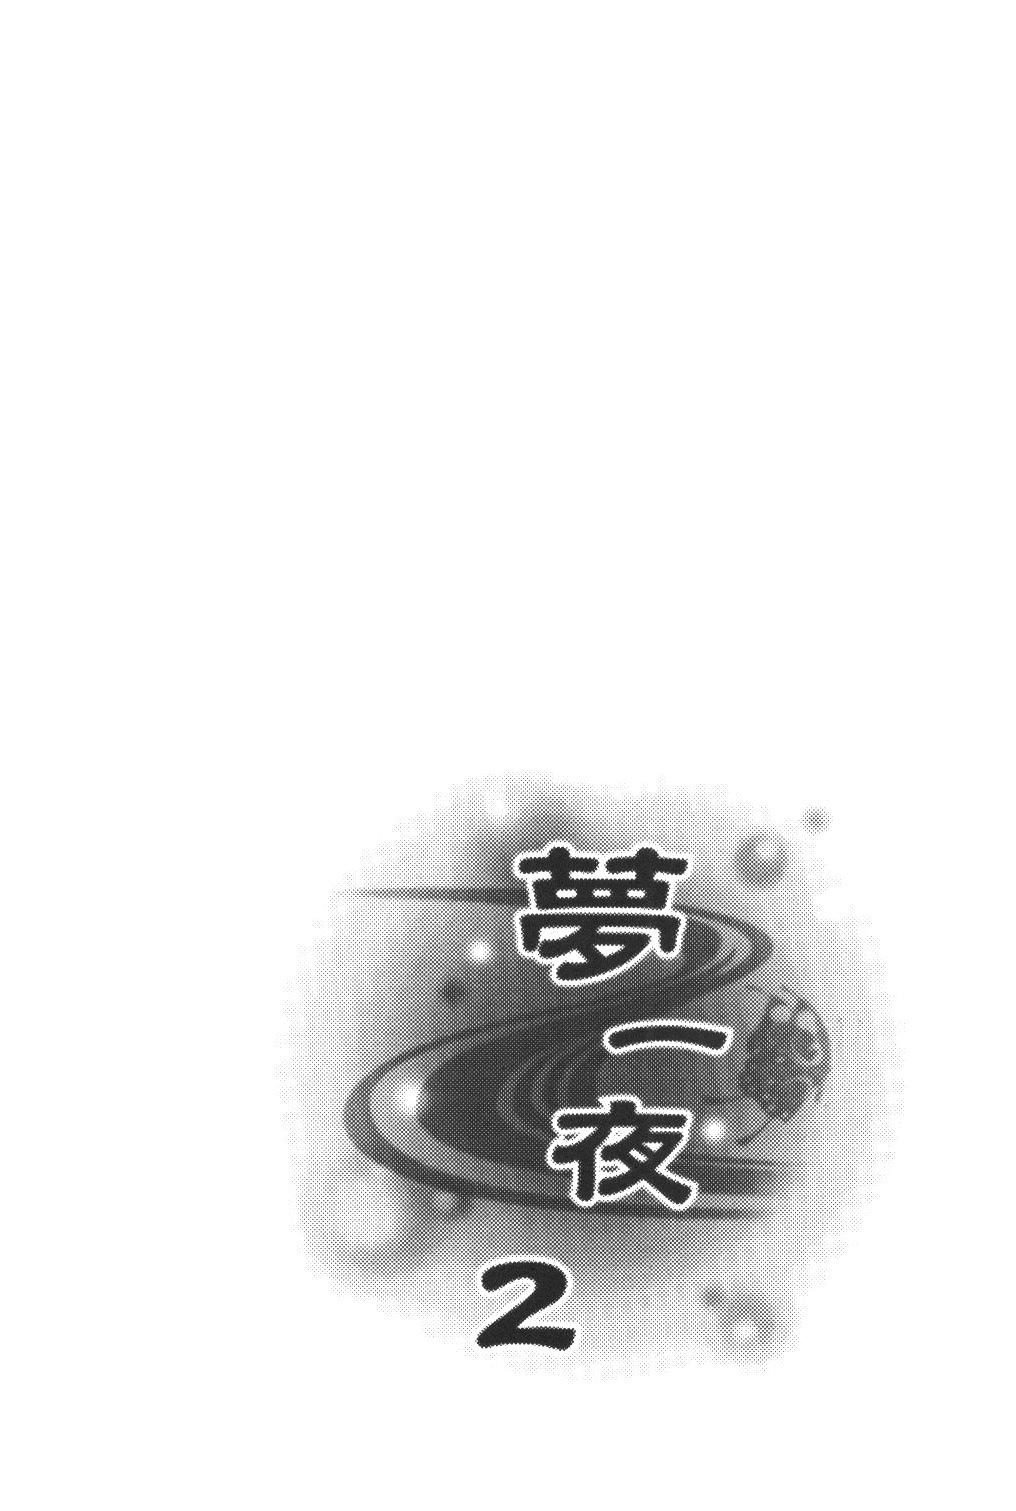 Yume Ichiya 2 38